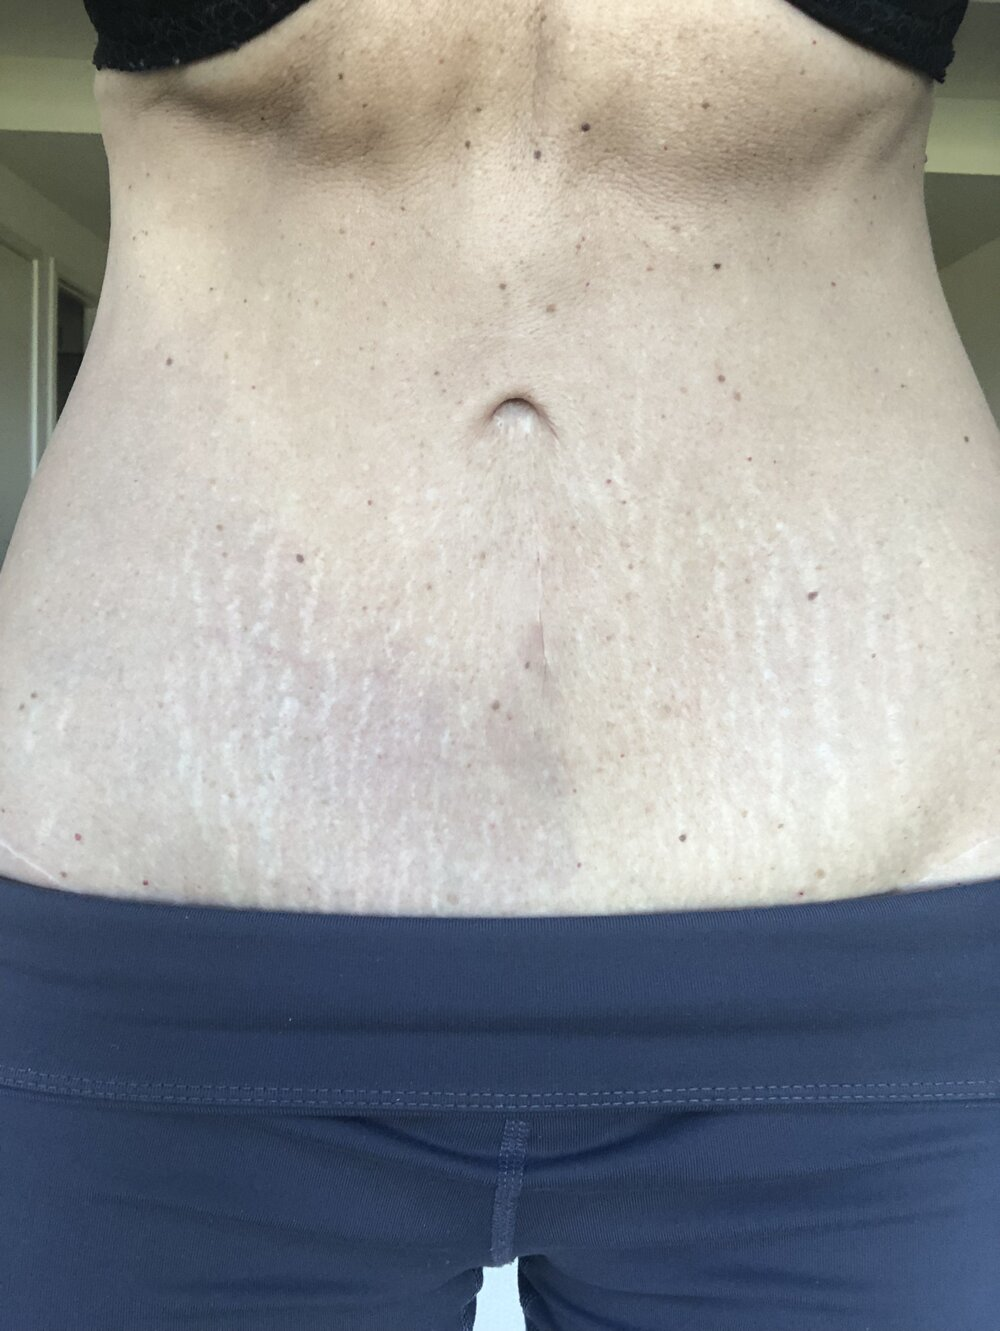 Stretch marks from pregnancy